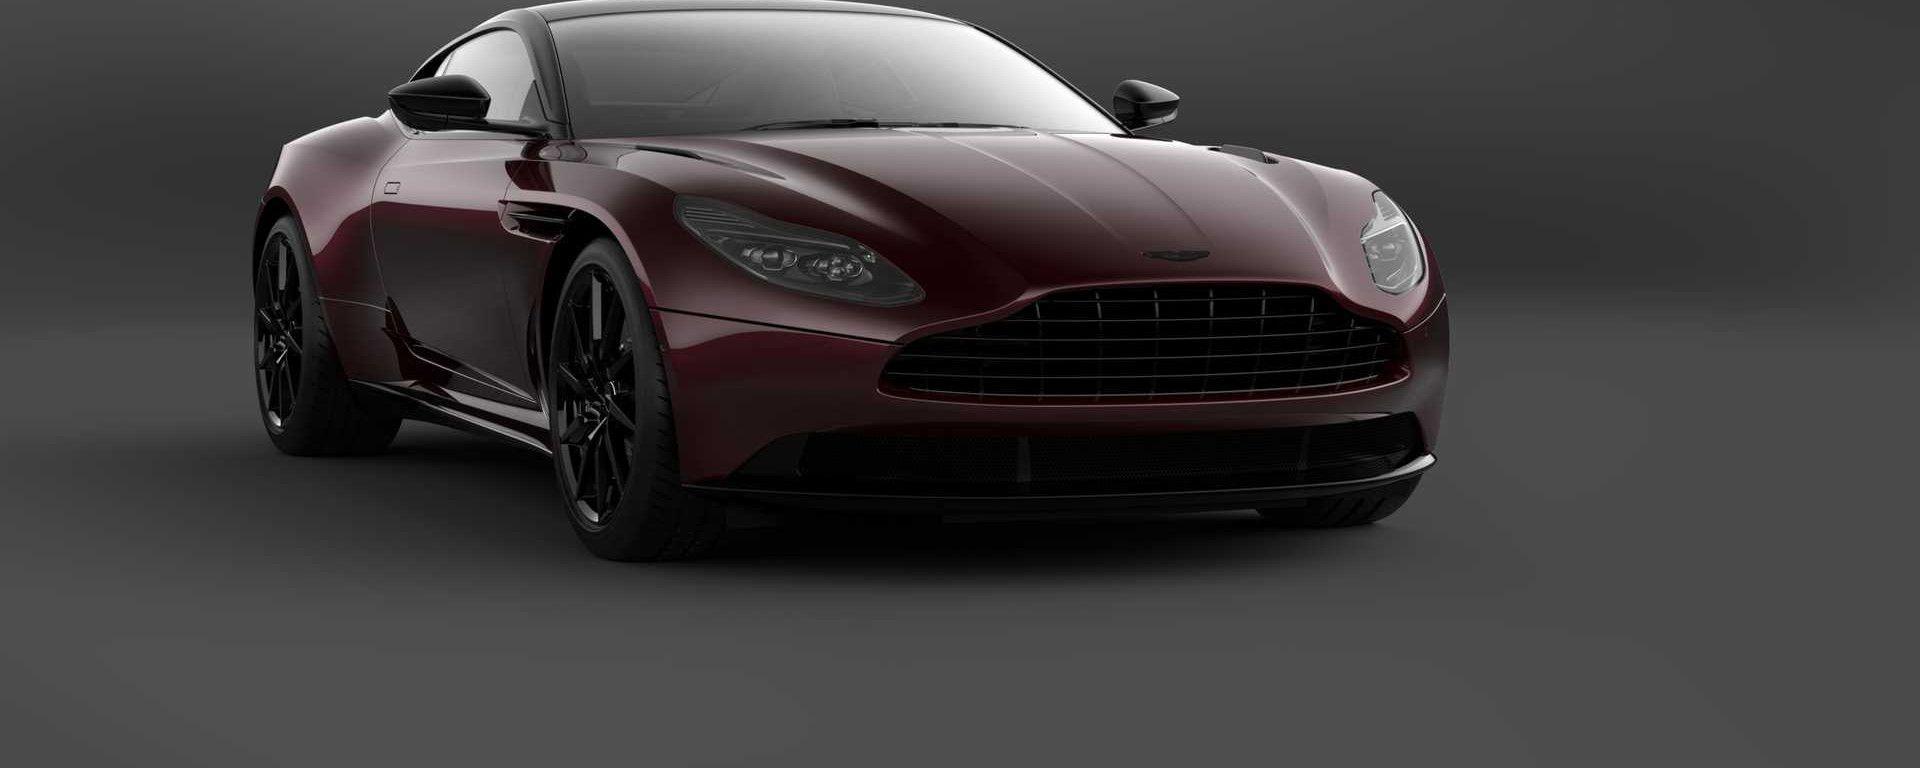 Aston Martin DB11 Shadow Edition: vista frontale